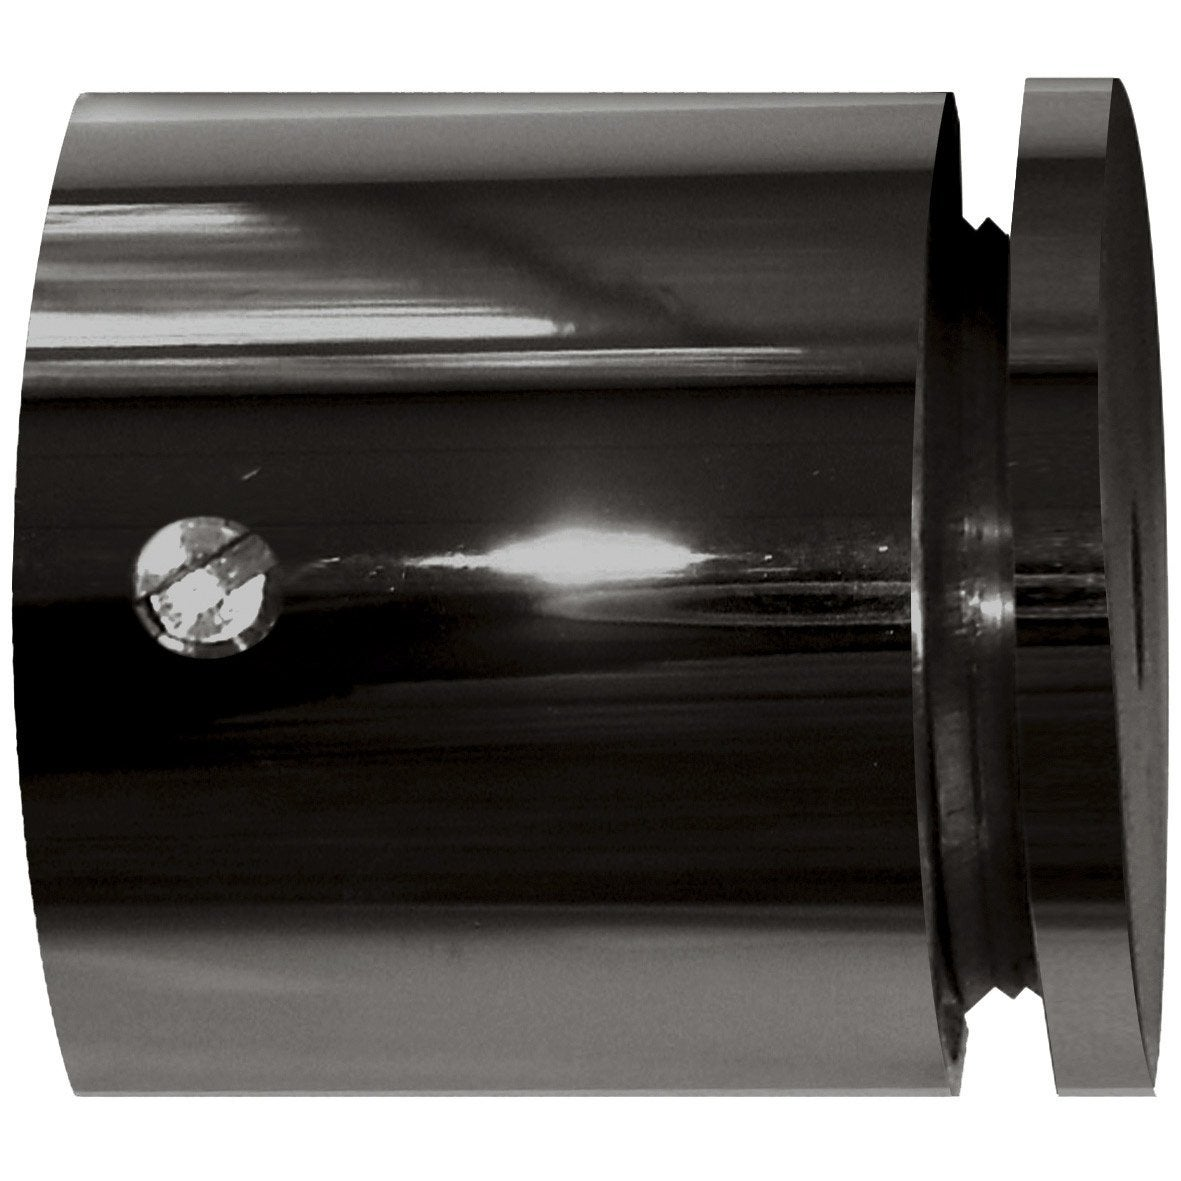 naissance tringle rideau classic chic nickel noir 20 mm noir leroy merlin. Black Bedroom Furniture Sets. Home Design Ideas